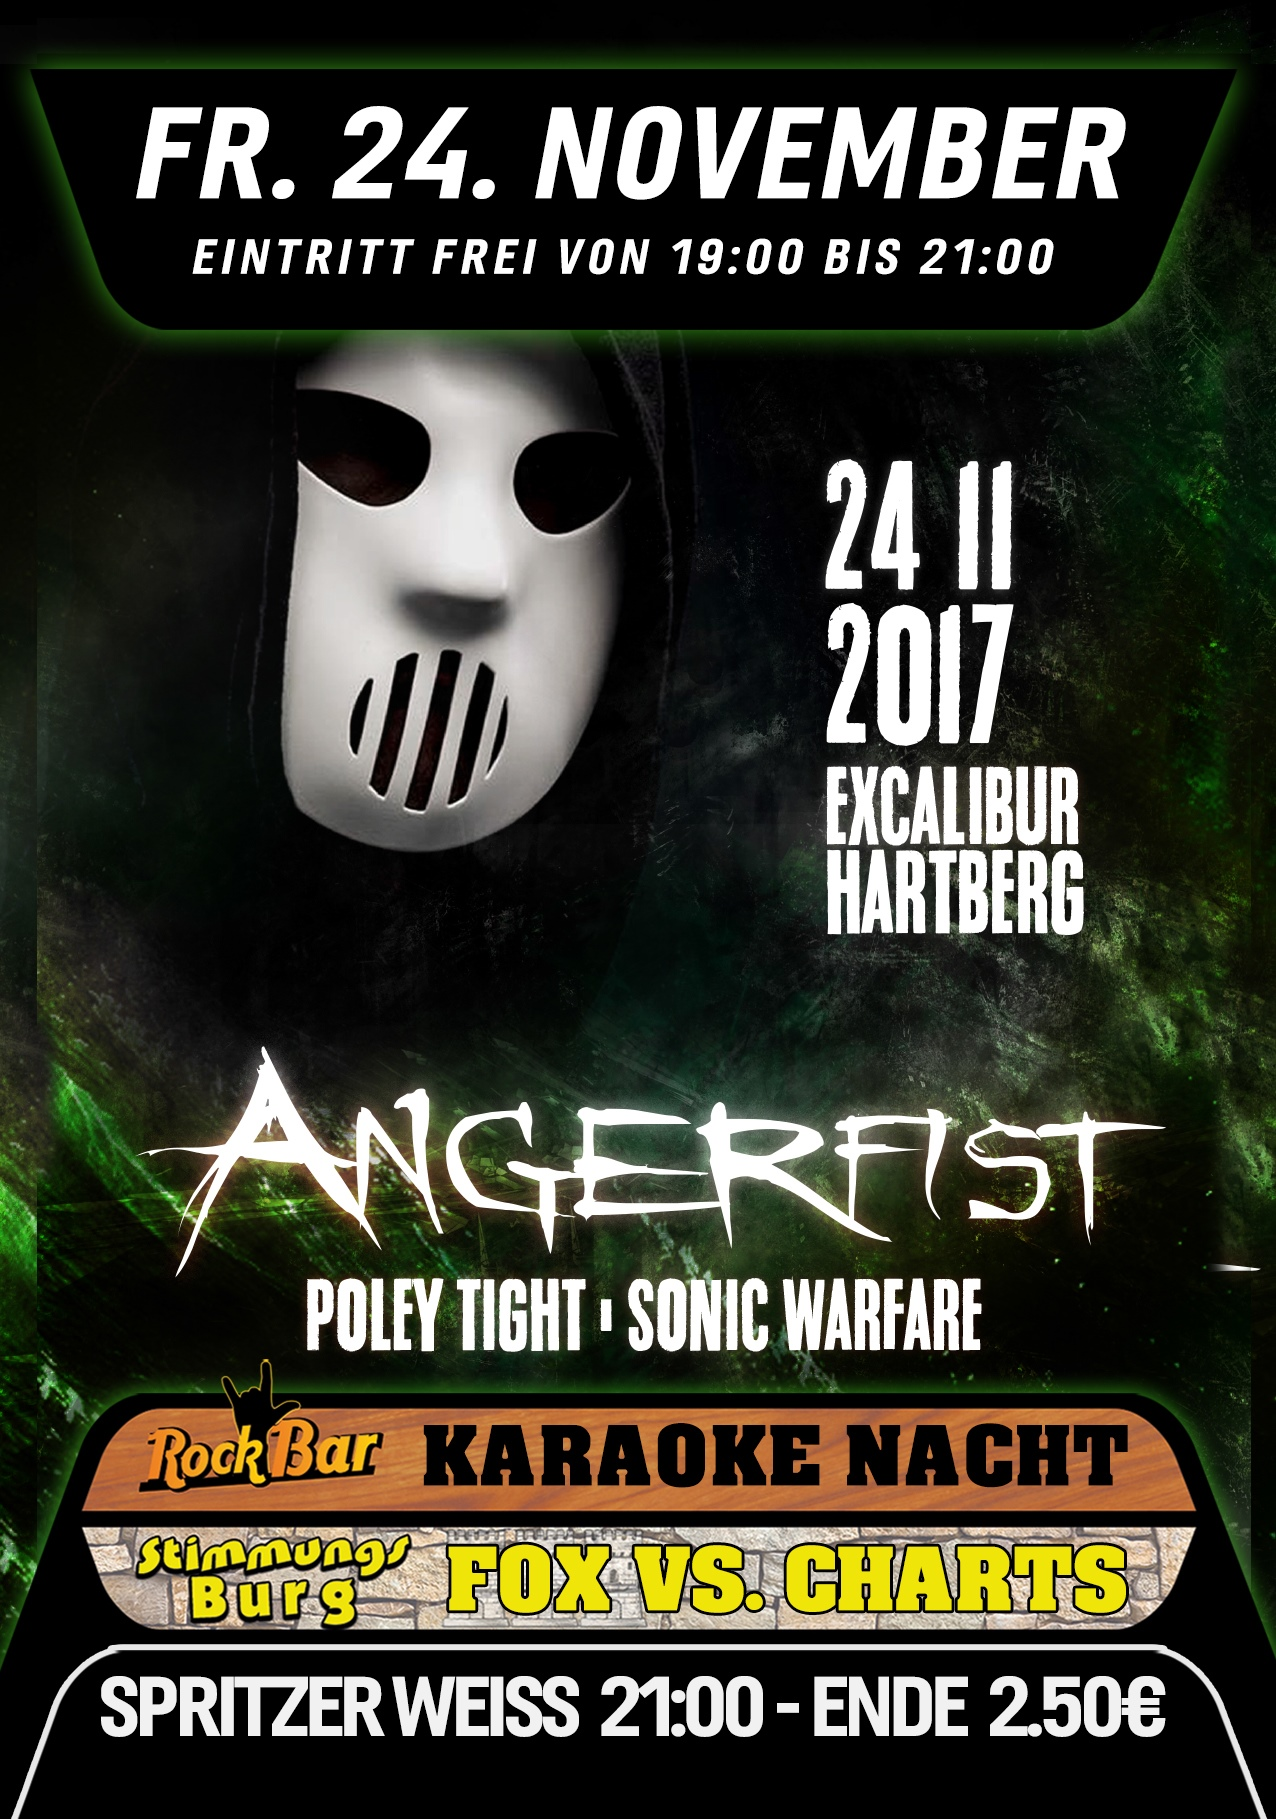 ANGERFIST LIVE! /w Poley Tight & Sonic Warfare